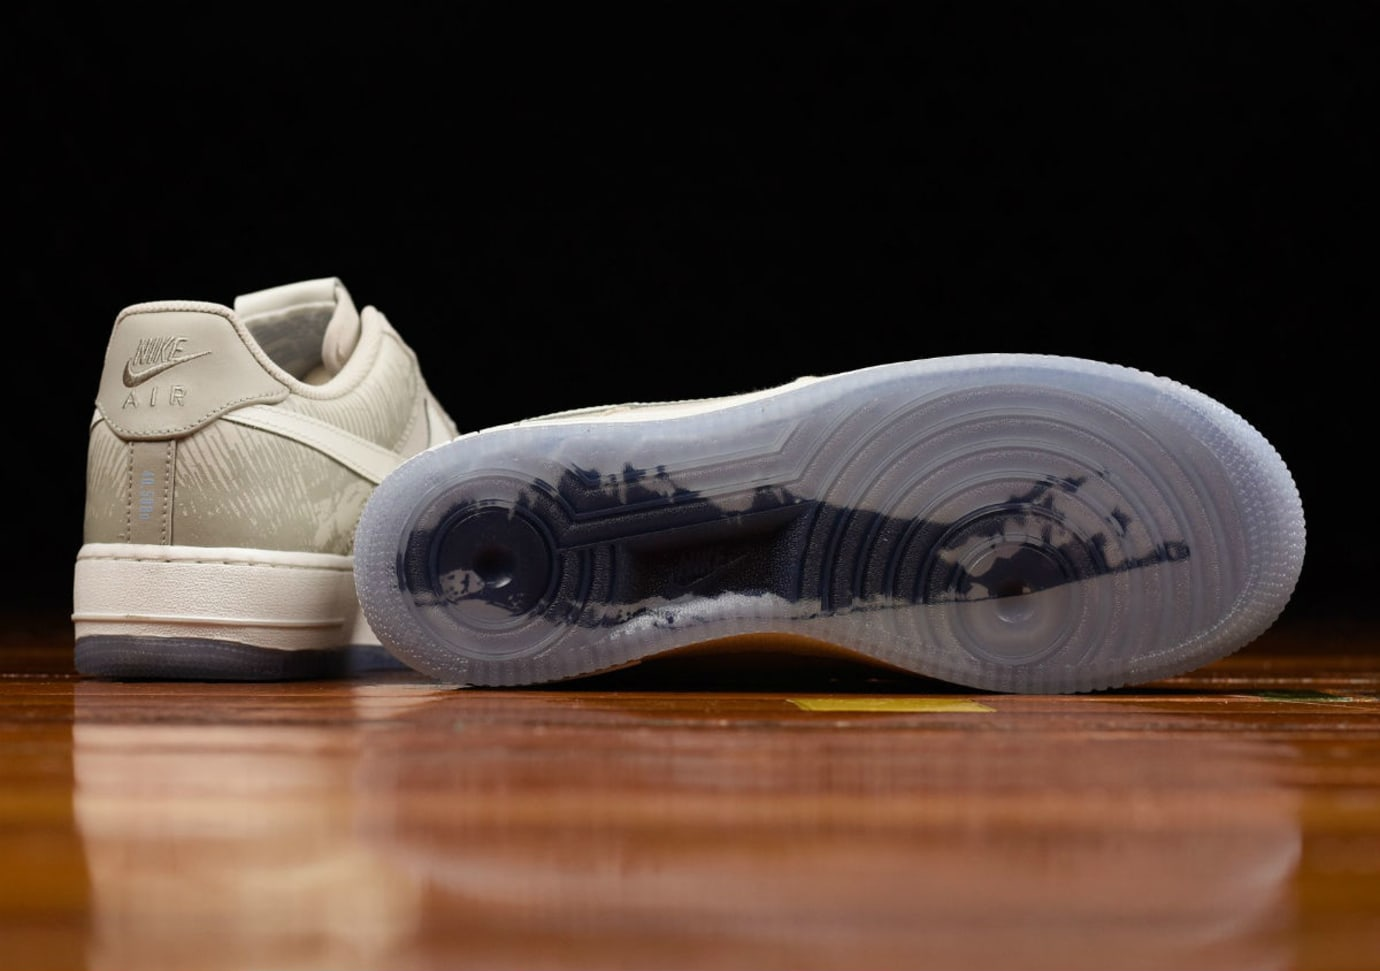 Nike Air Force 1 Low Jones Beach 2017 Retro Sole 845053-203